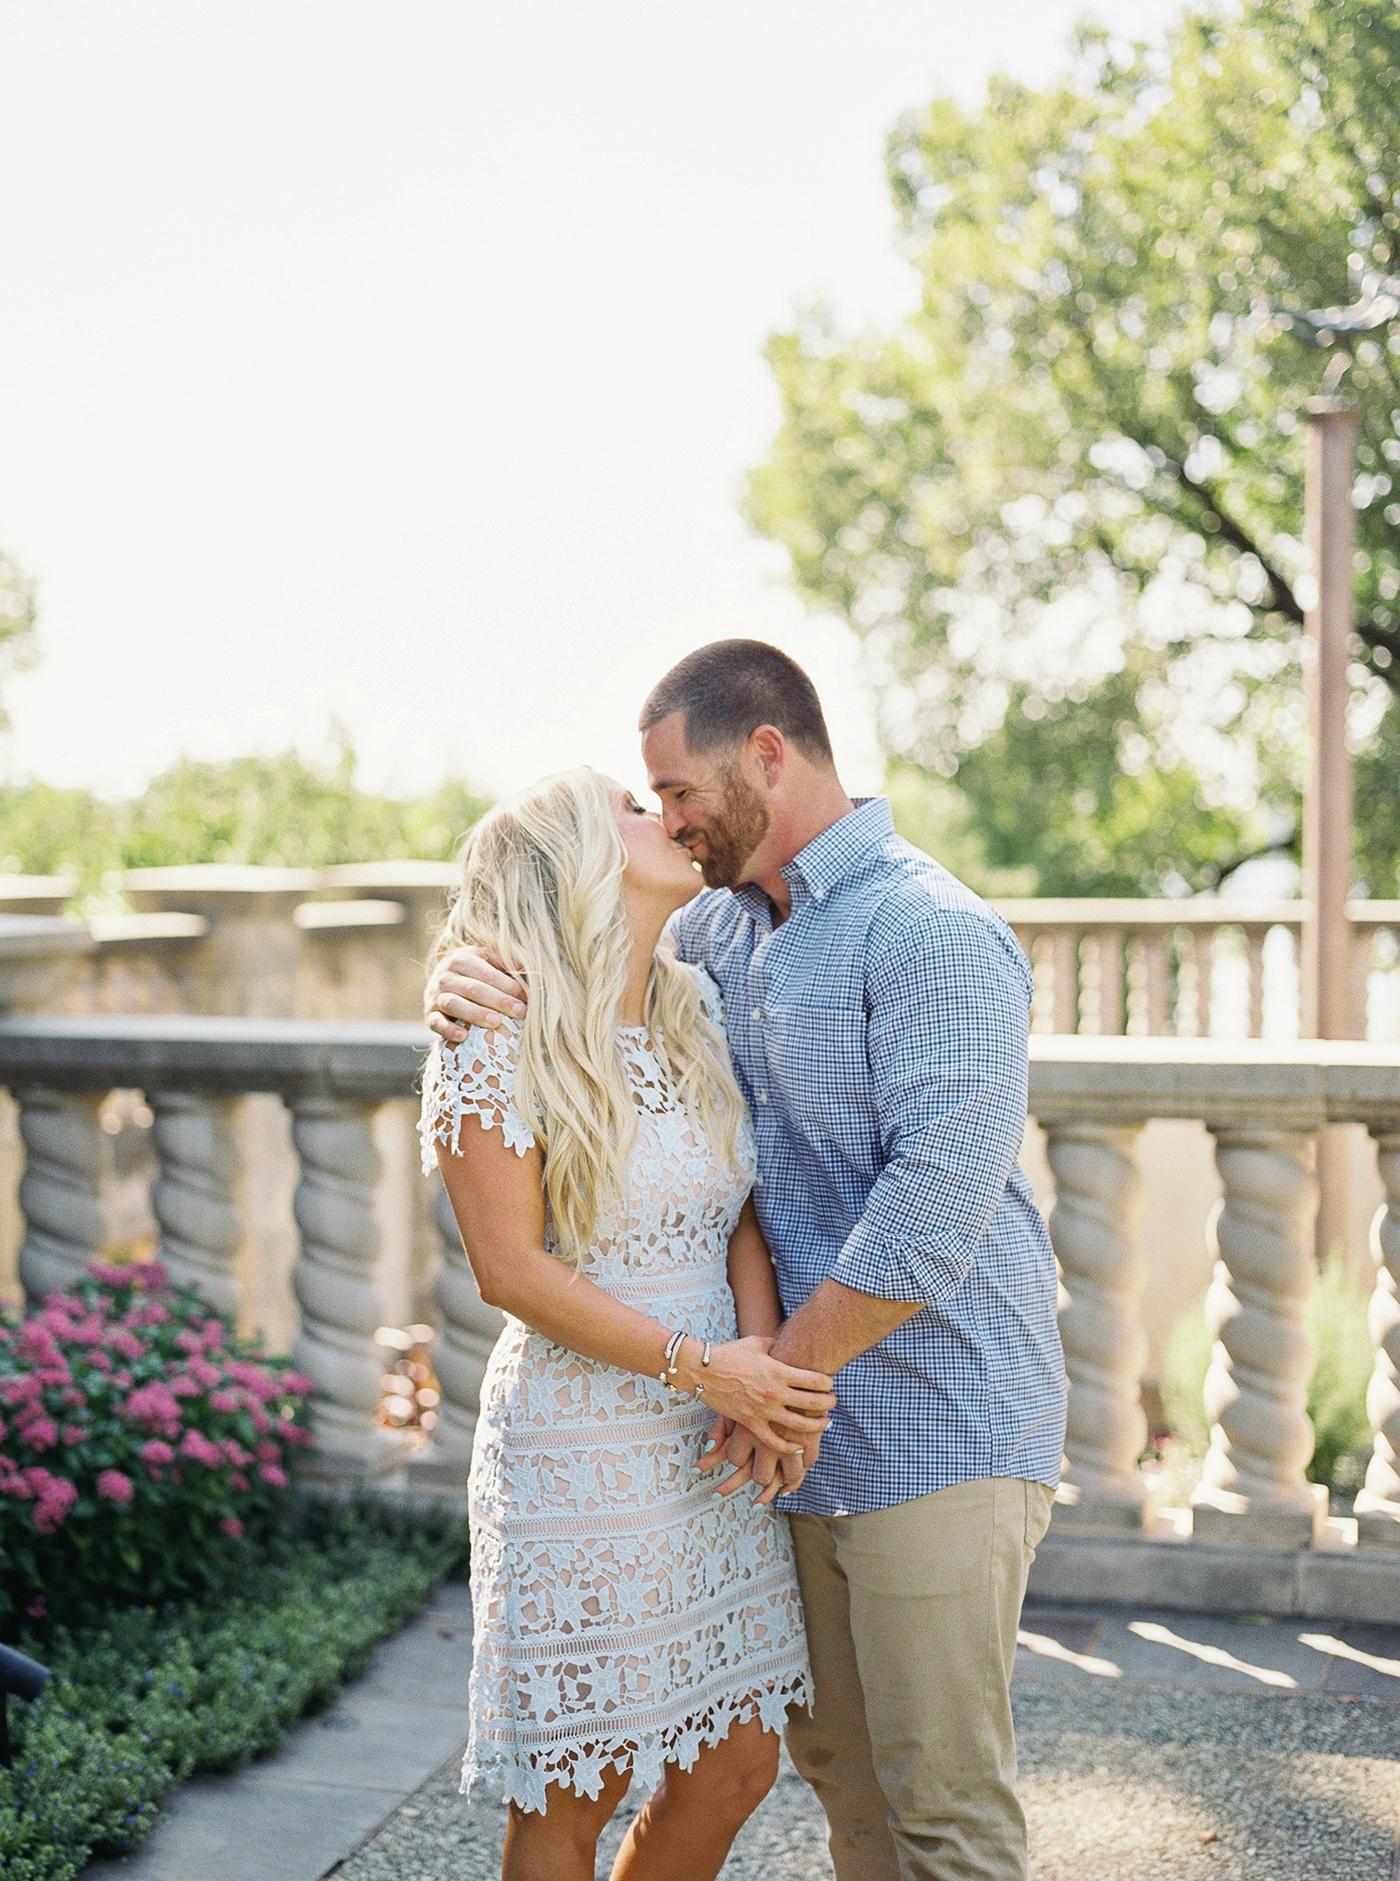 DFW Wedding Plannning | Allday Events | Dallas Arboretum Engagement Session | 00033.jpg